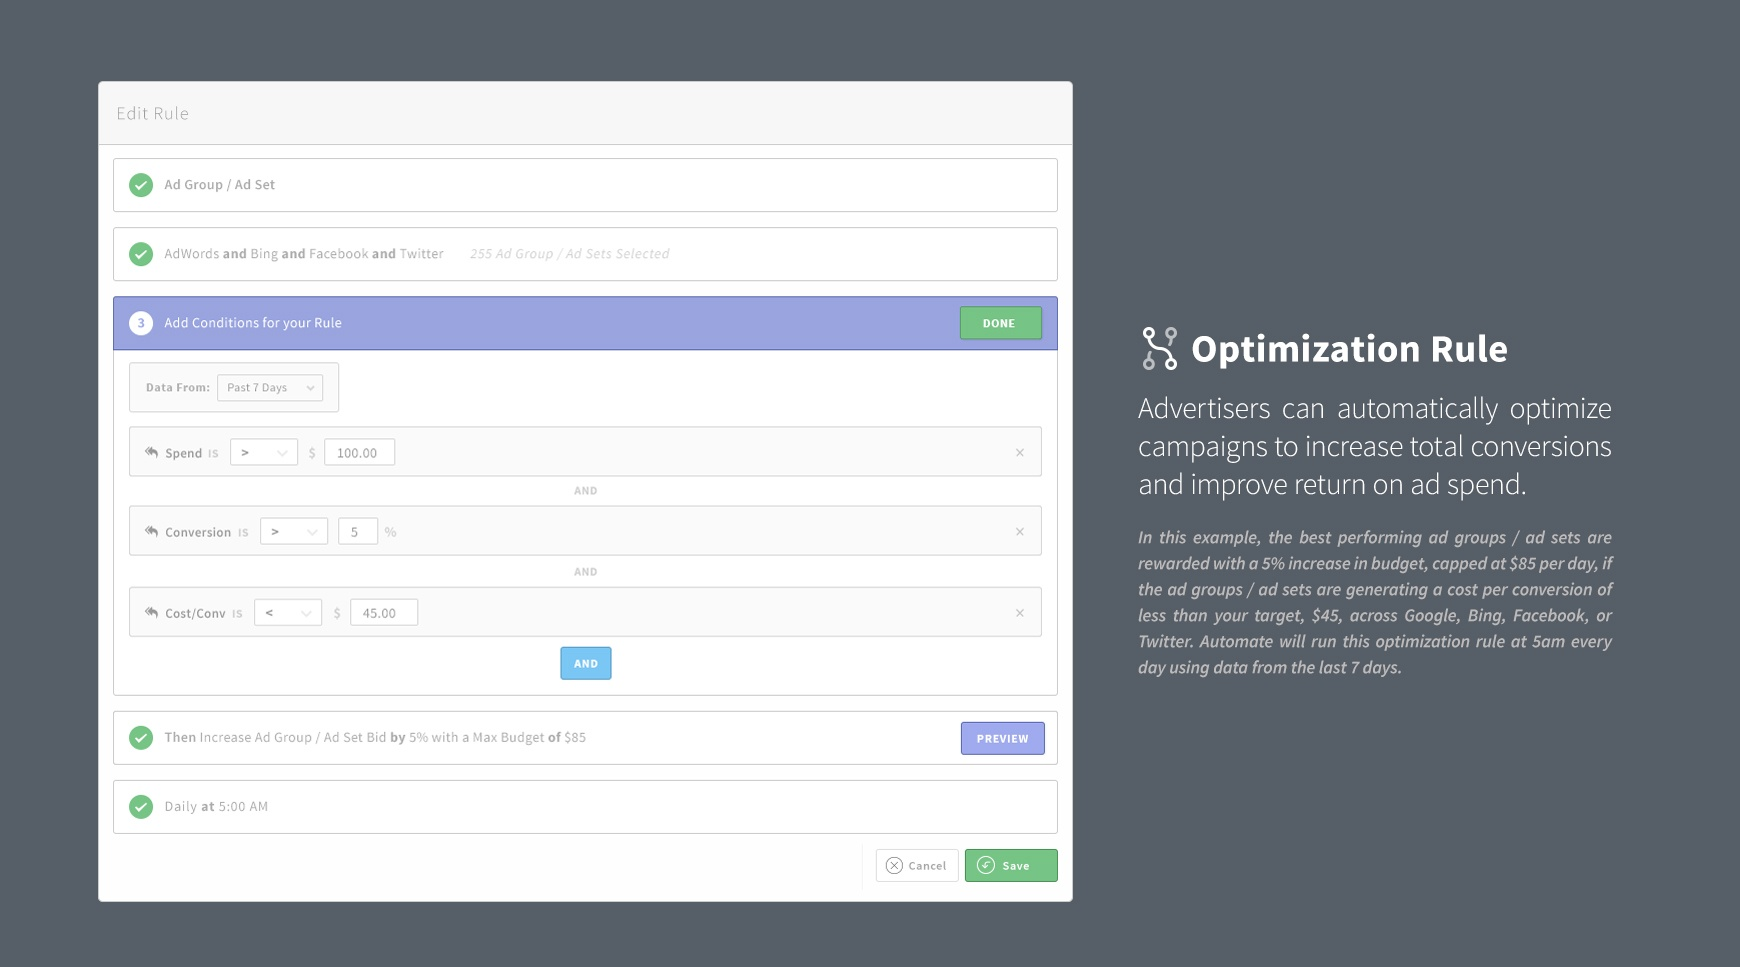 Optimization_Rule